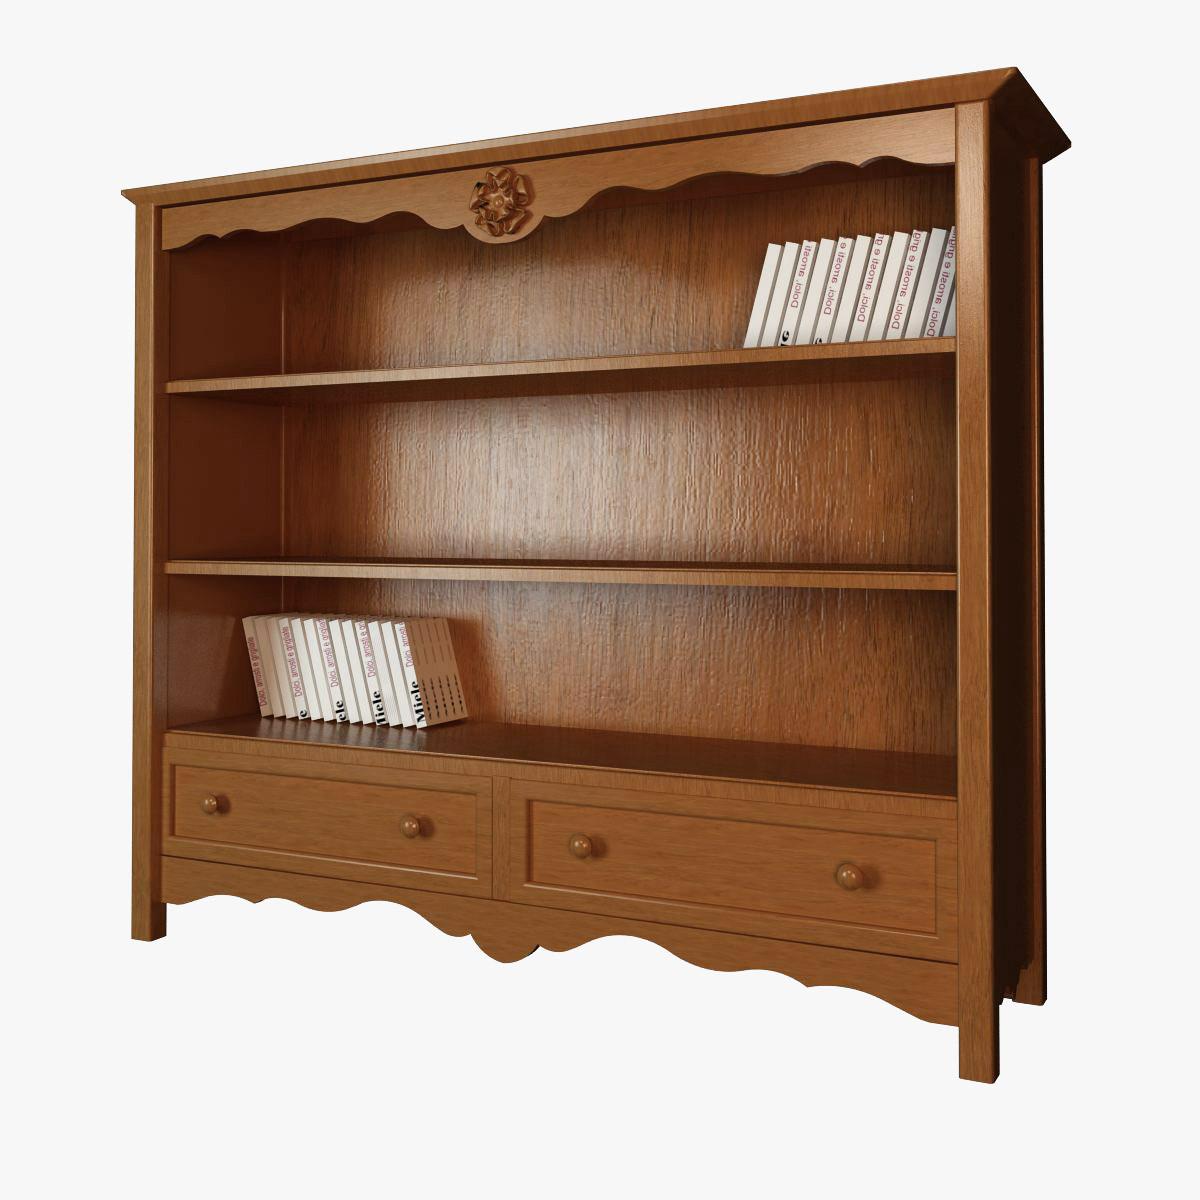 Bookcase Halley